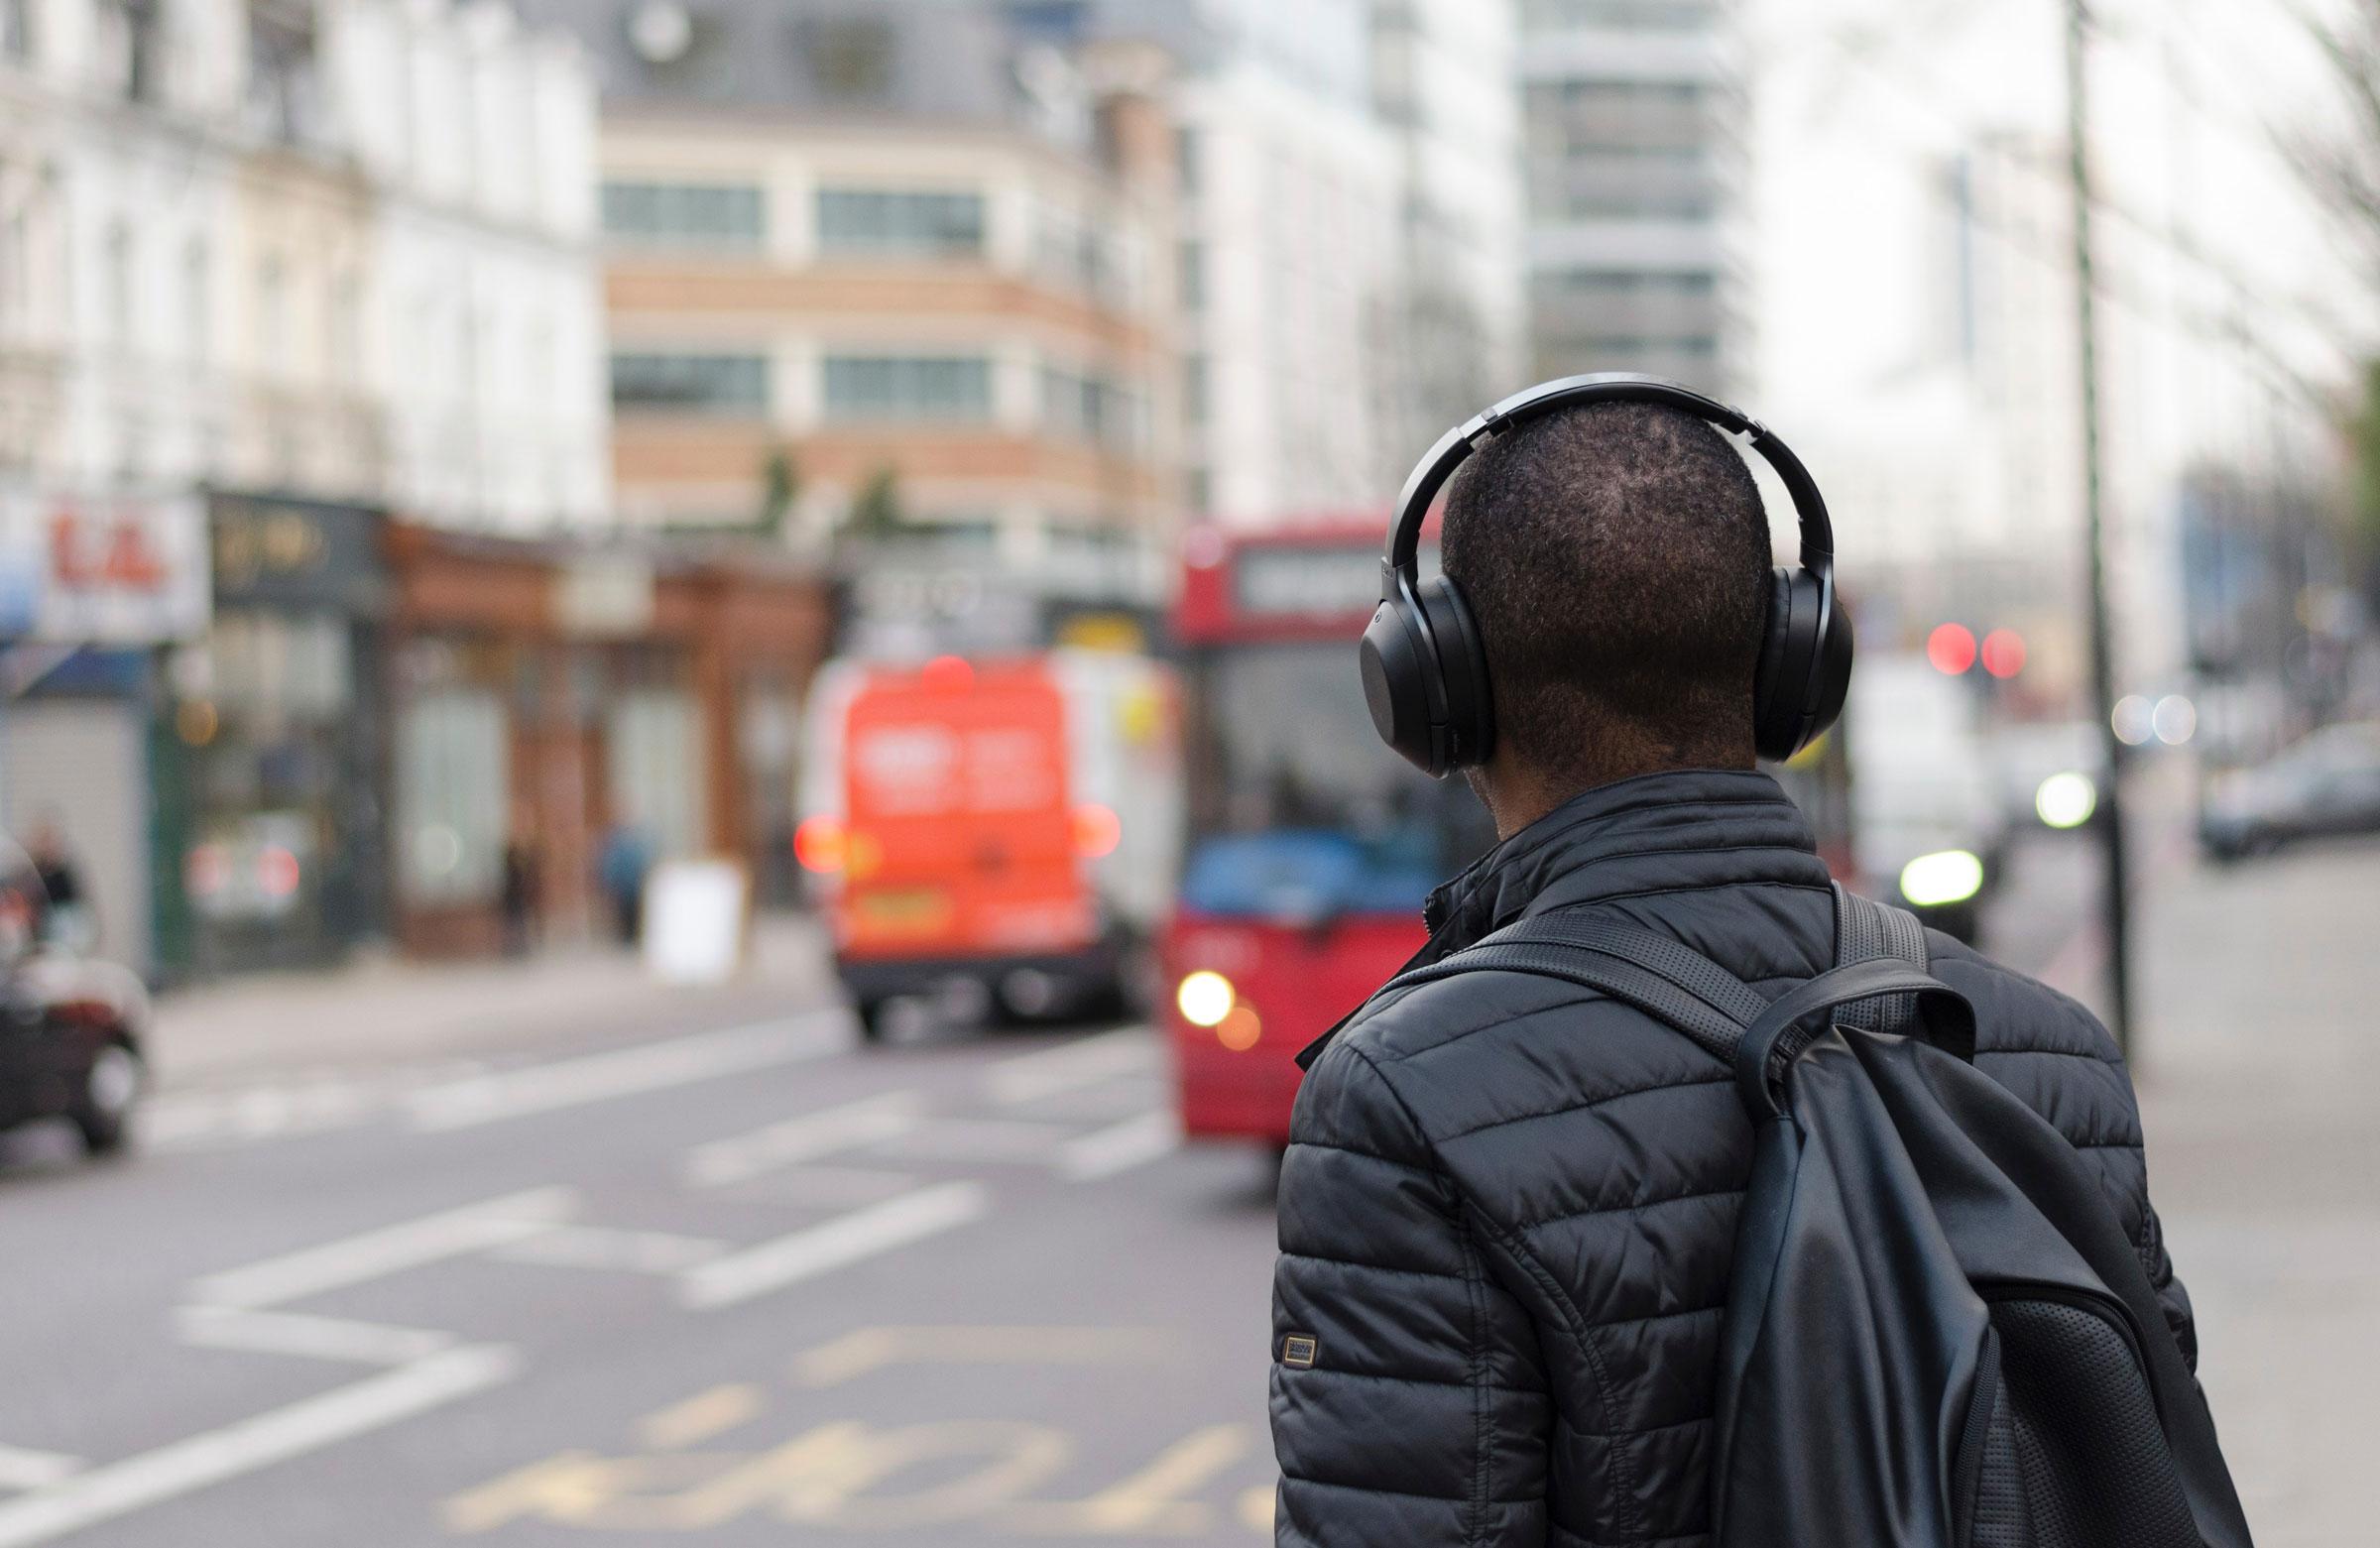 Podcast listeners